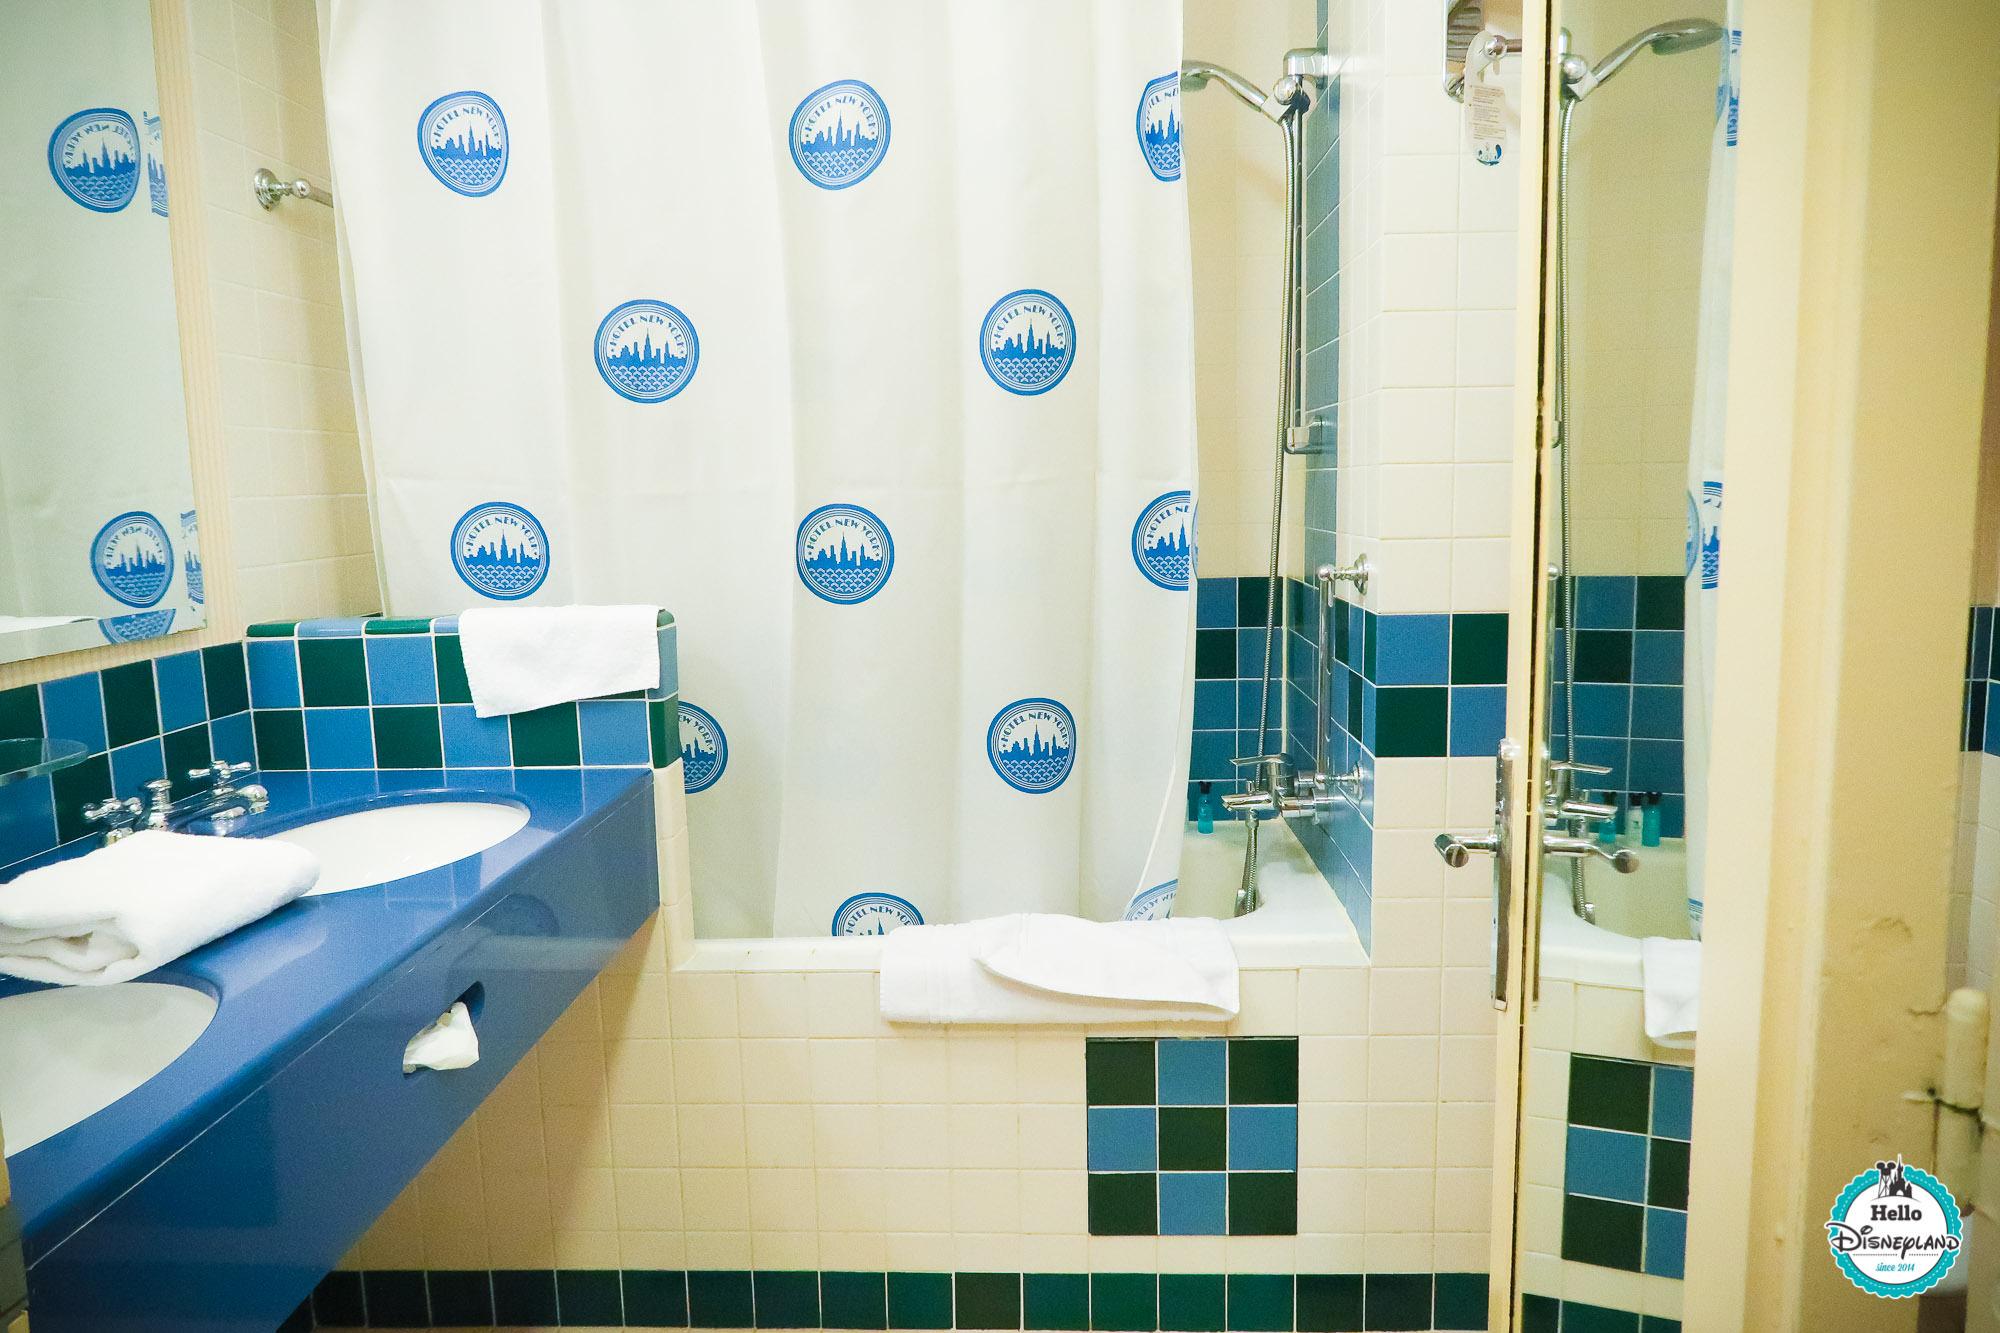 New York Hotel - Disneyland Paris